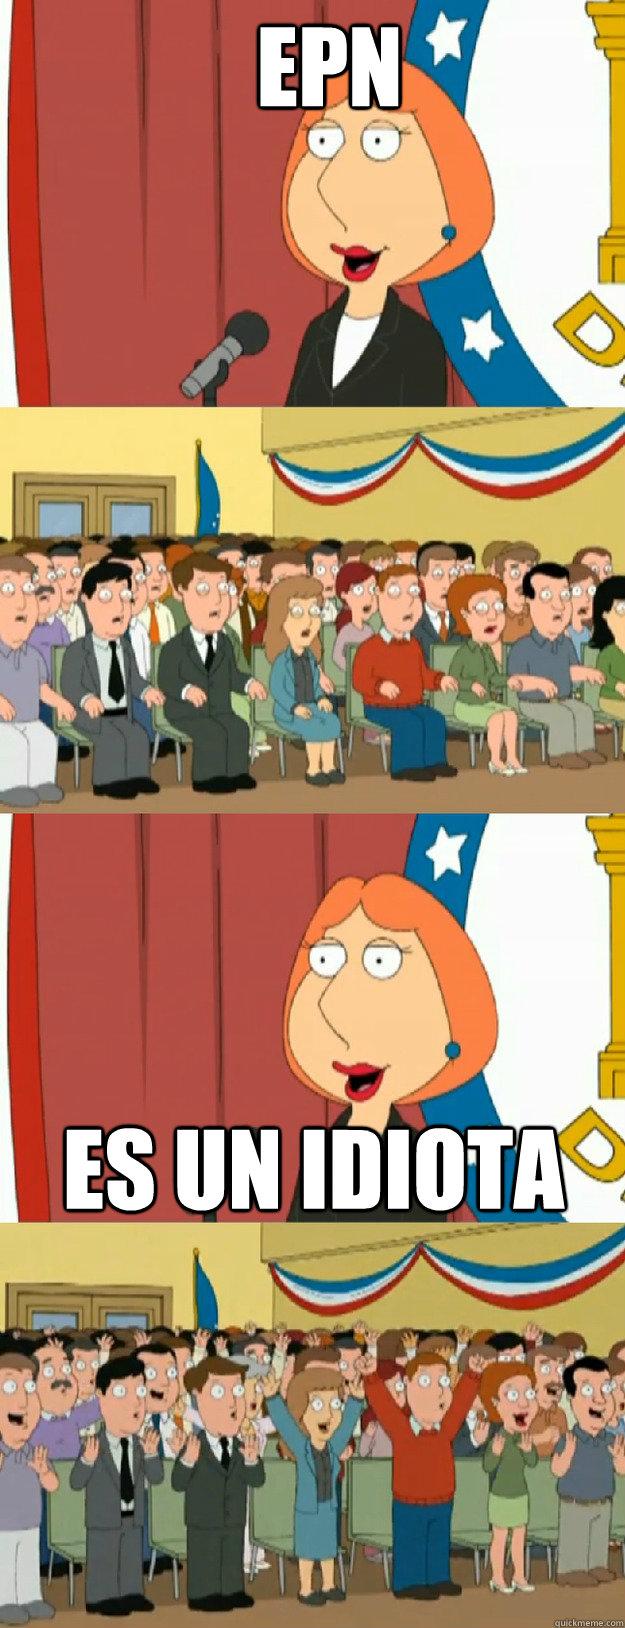 EPN es un idiota - EPN es un idiota  Lois Griffin